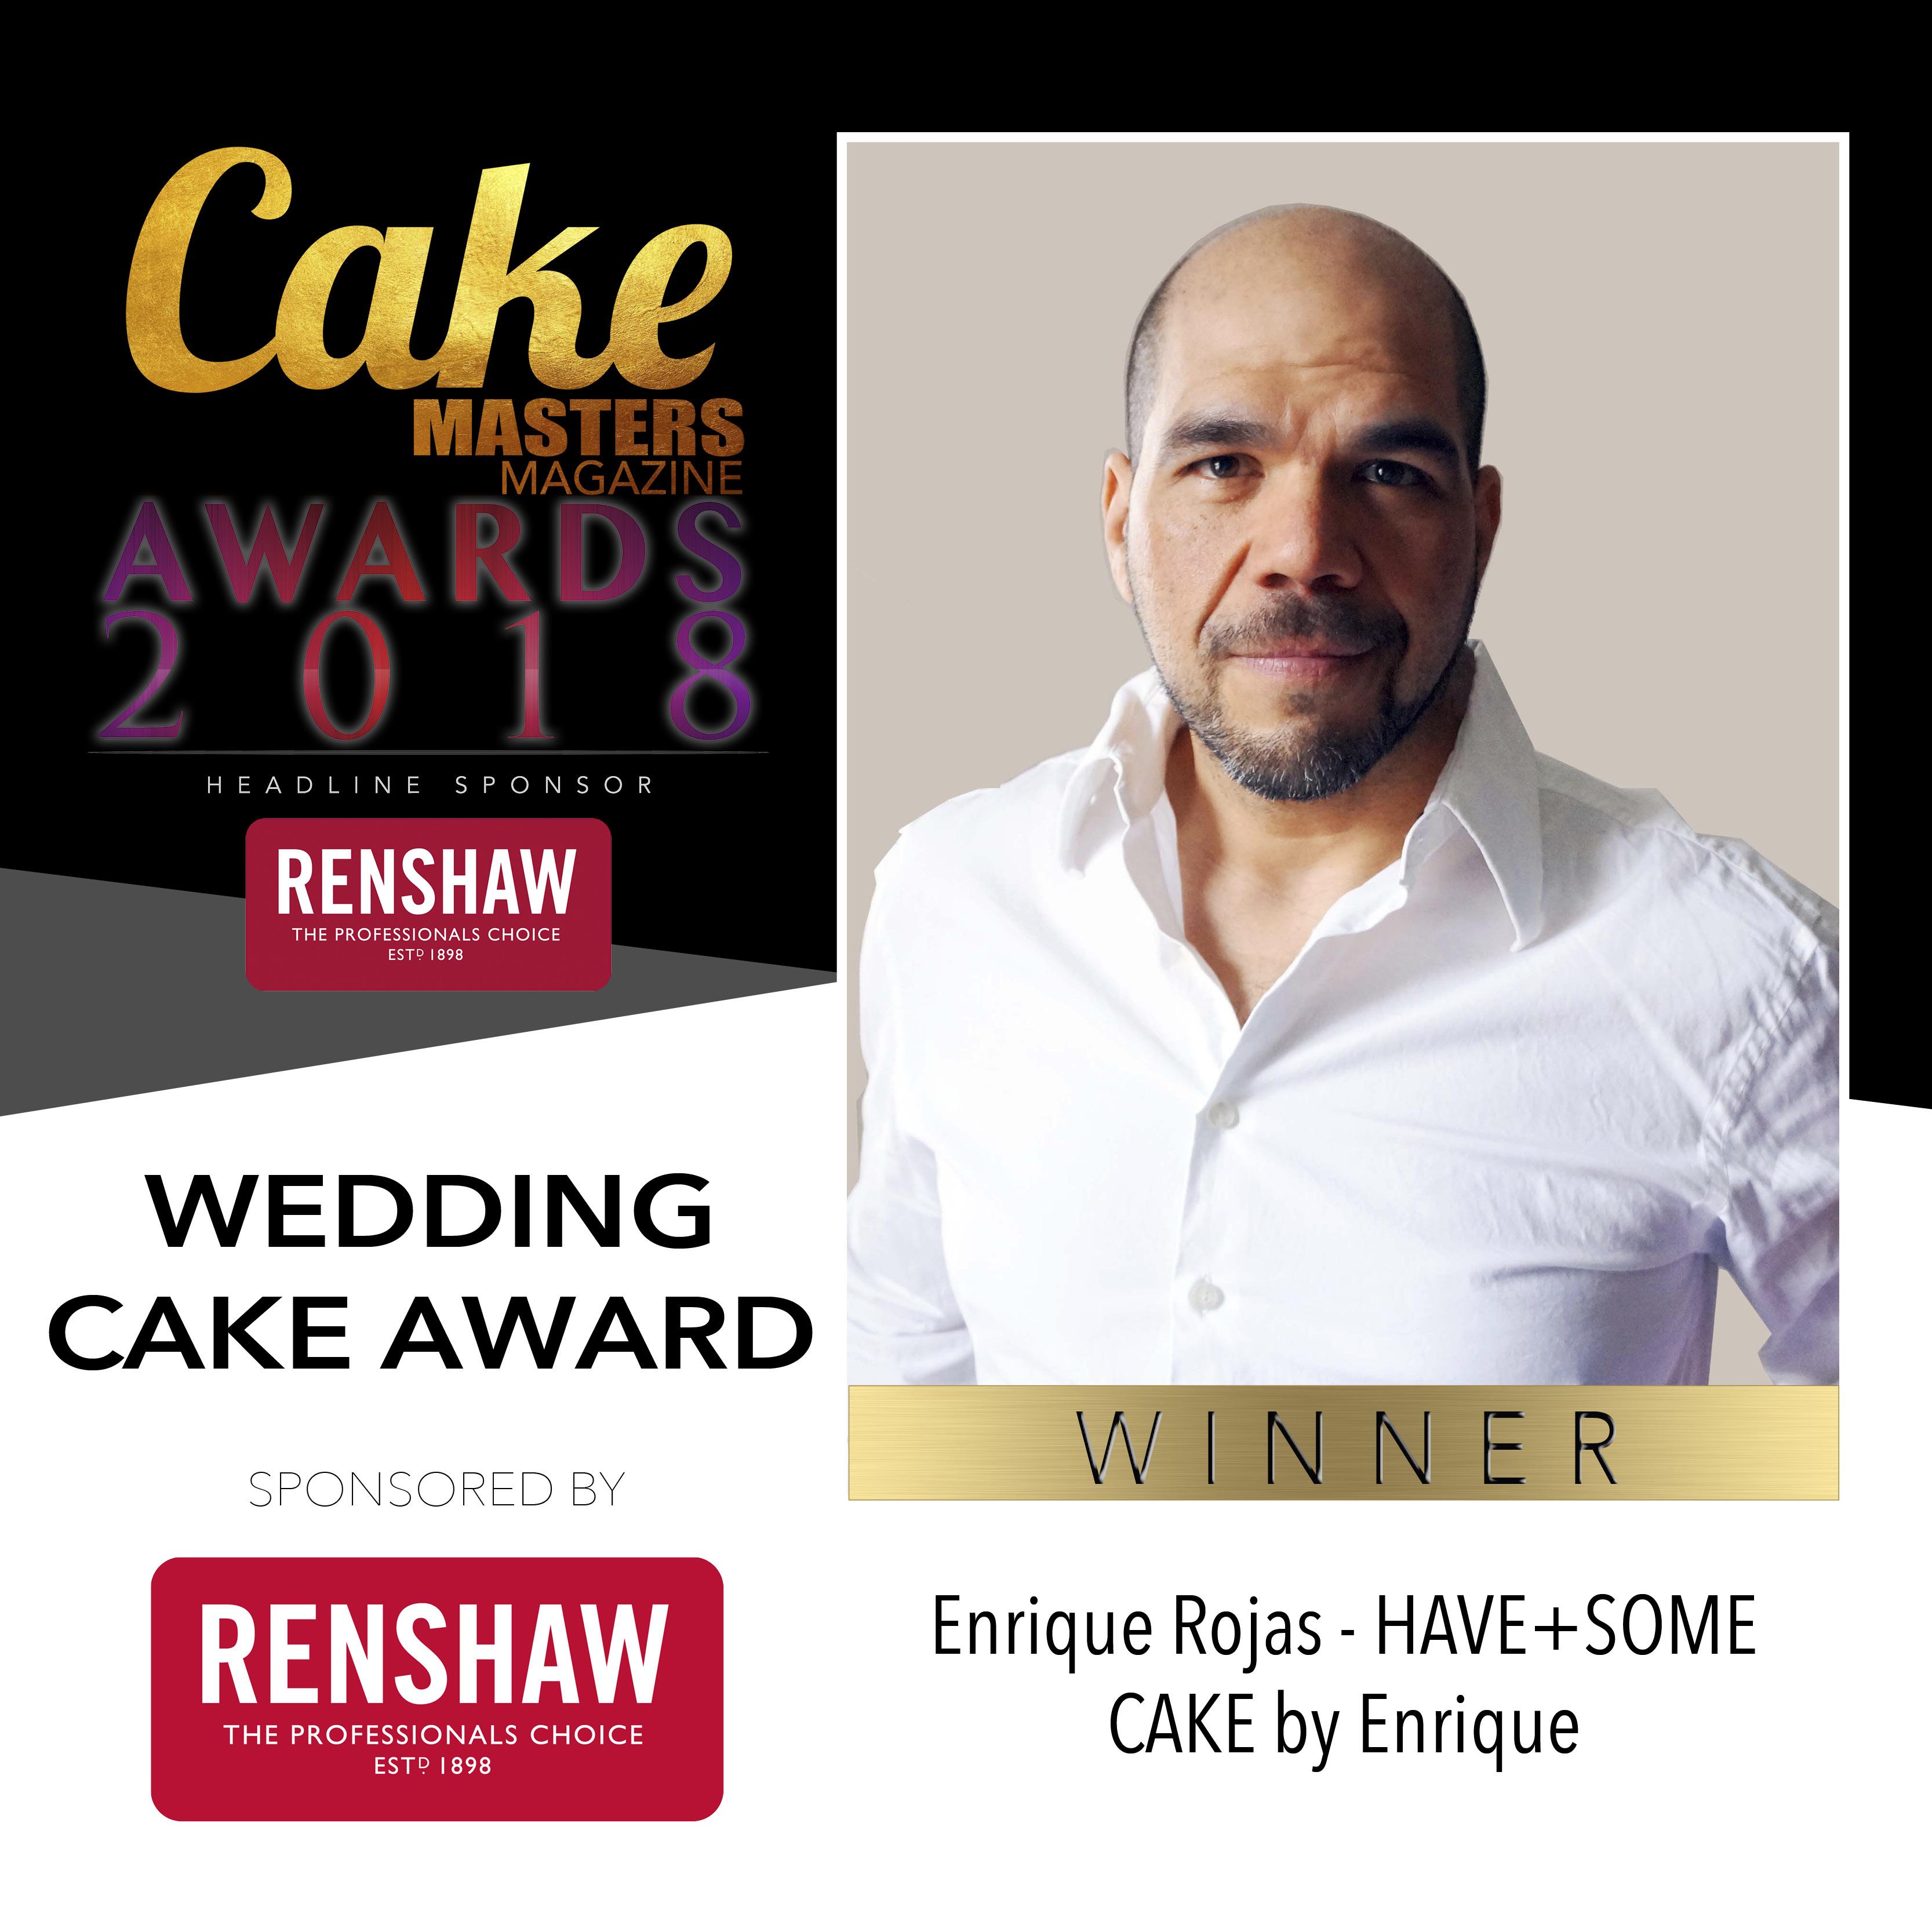 Wedding Cake Award